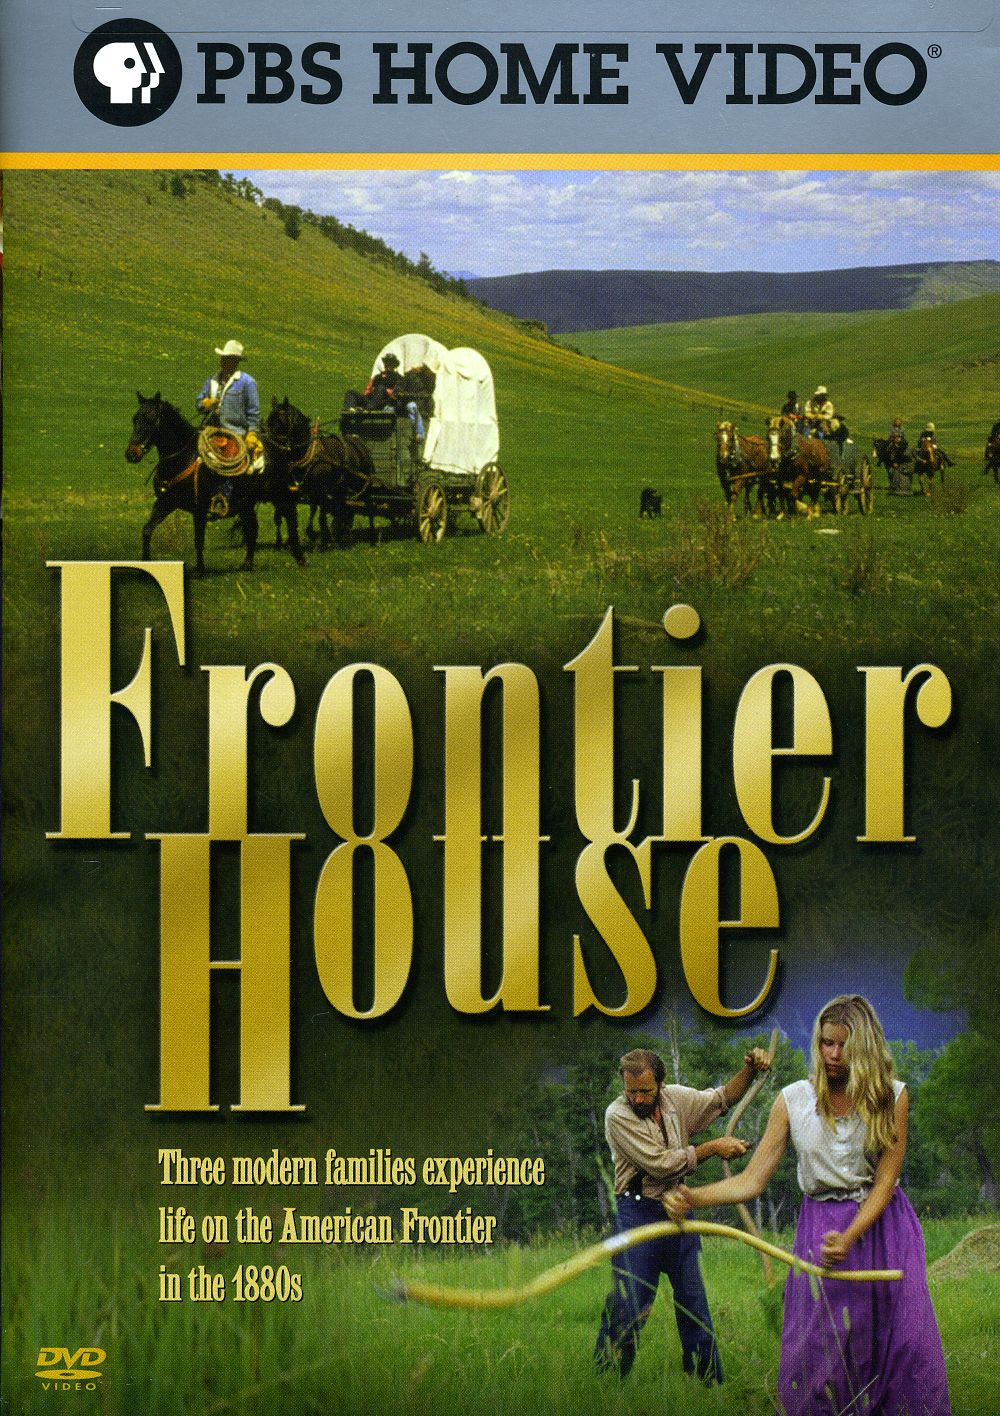 Frontier House: Season 1